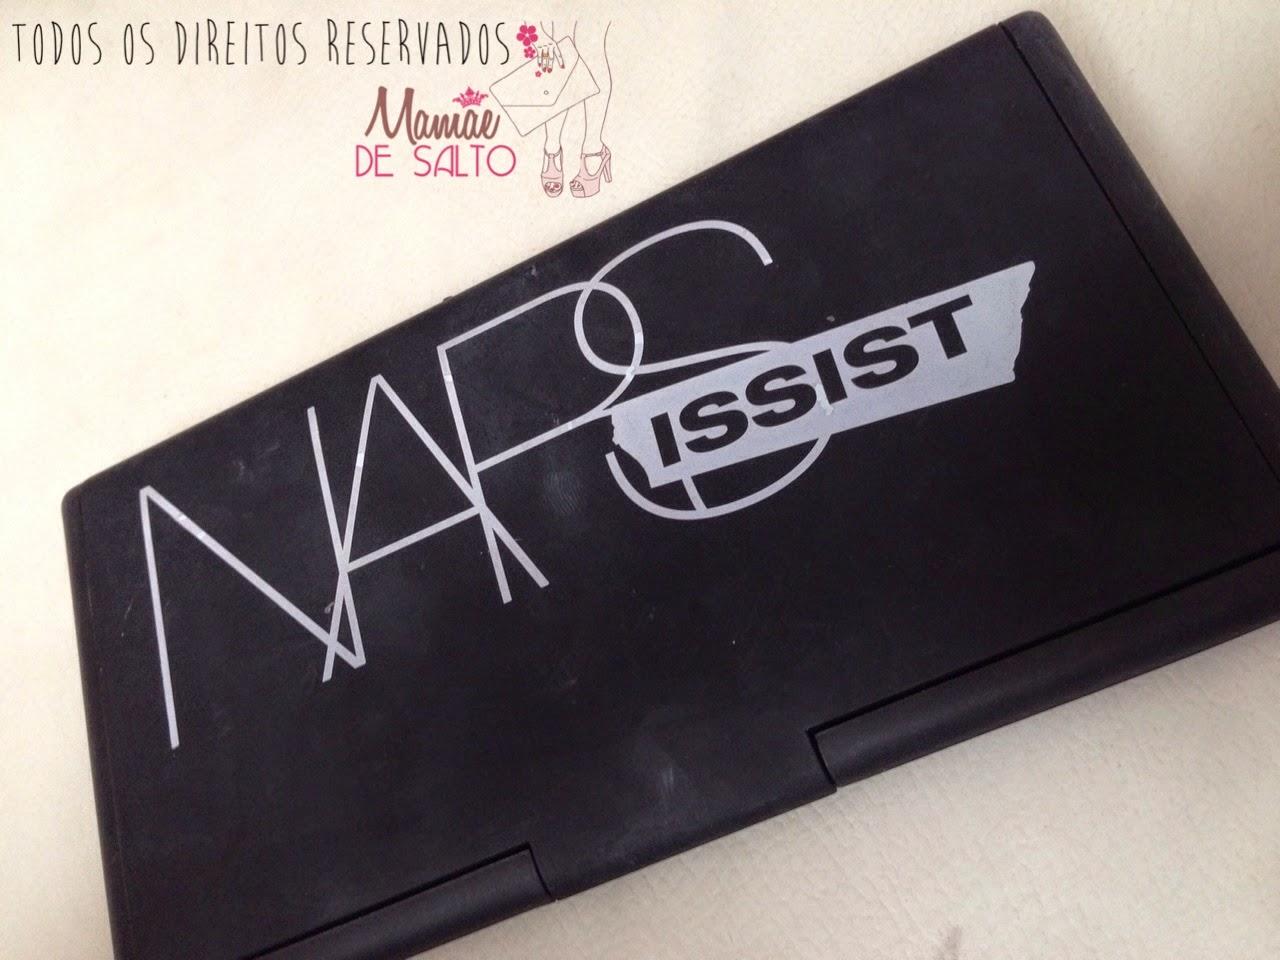 Paleta de sombras NARS NARSissist / blog Mamãe de Salto